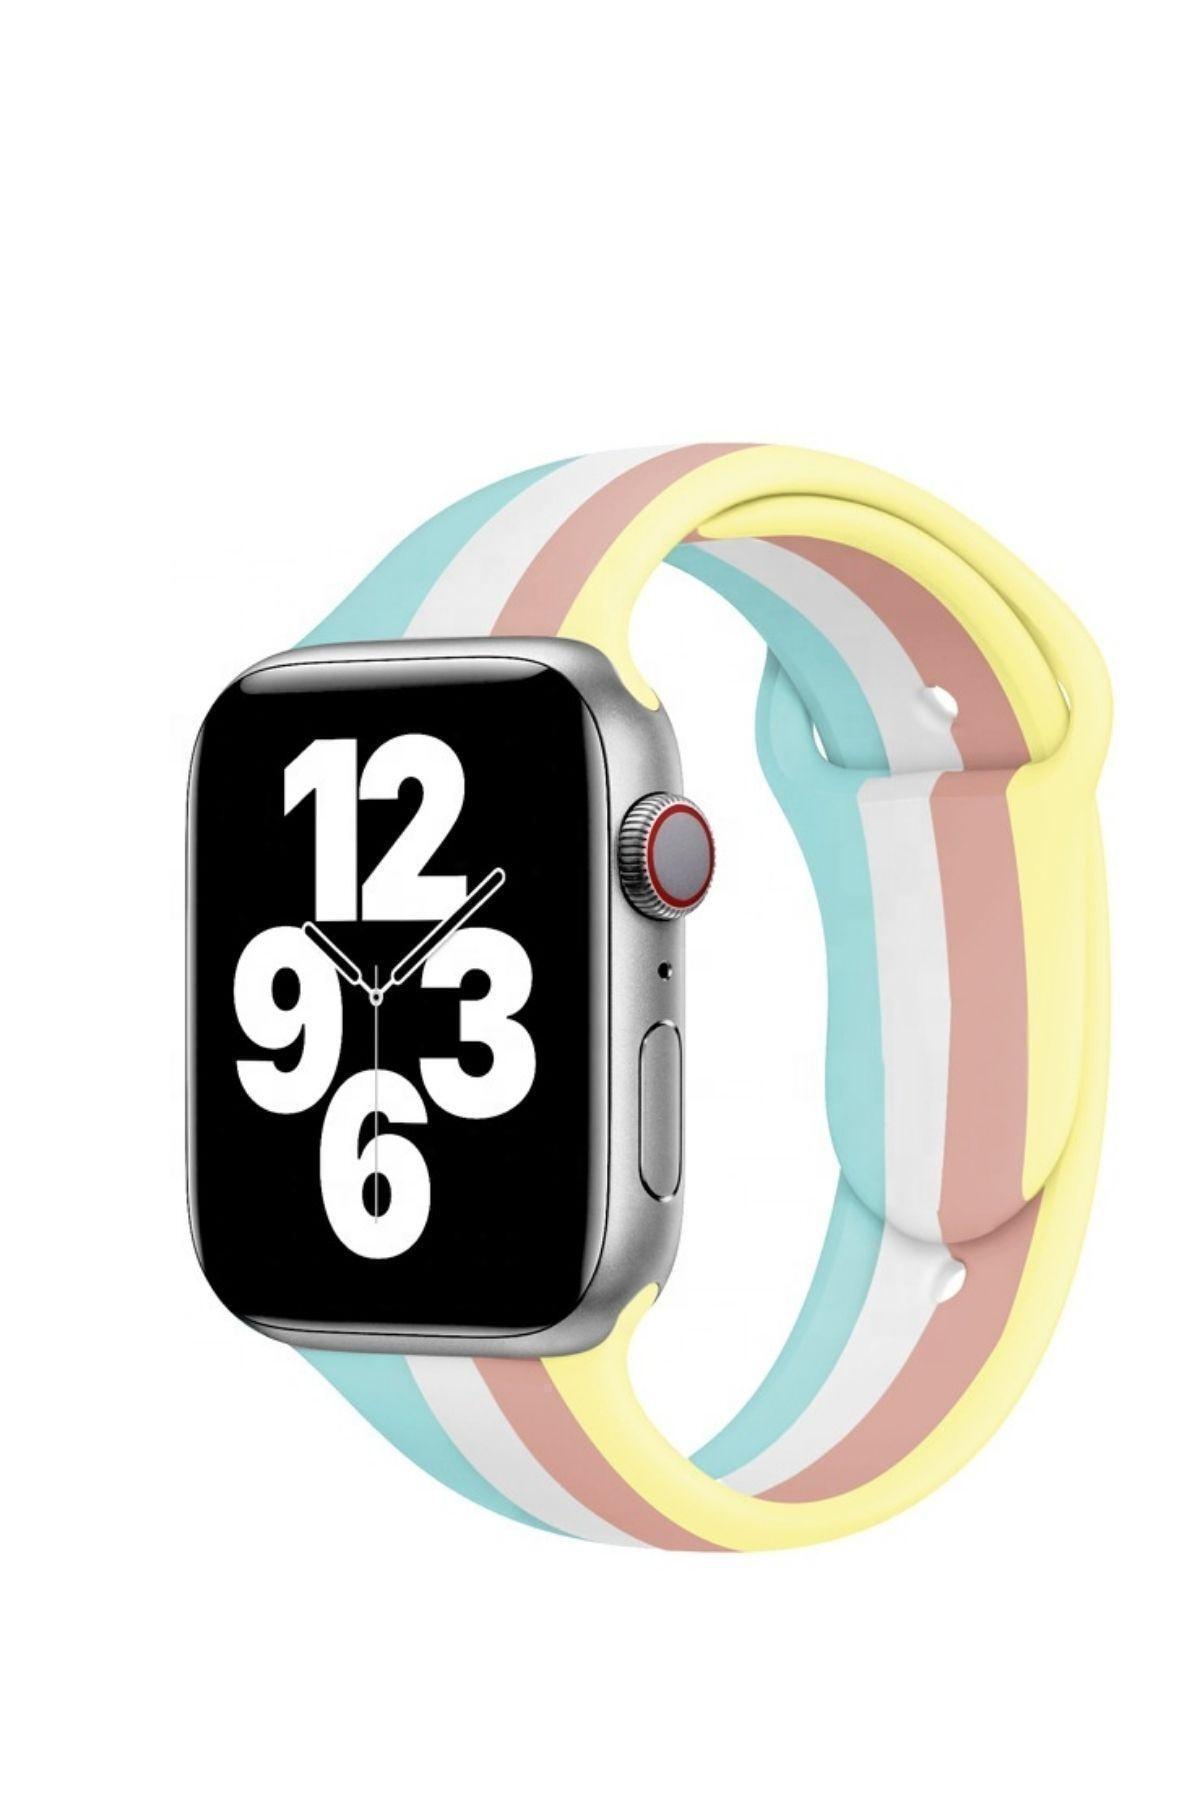 Apple Watch 1-2-3-4-5-6-se Serisi ( 38mm - 40mm ) Uyumlu Renki Yeni Silikon Kordon